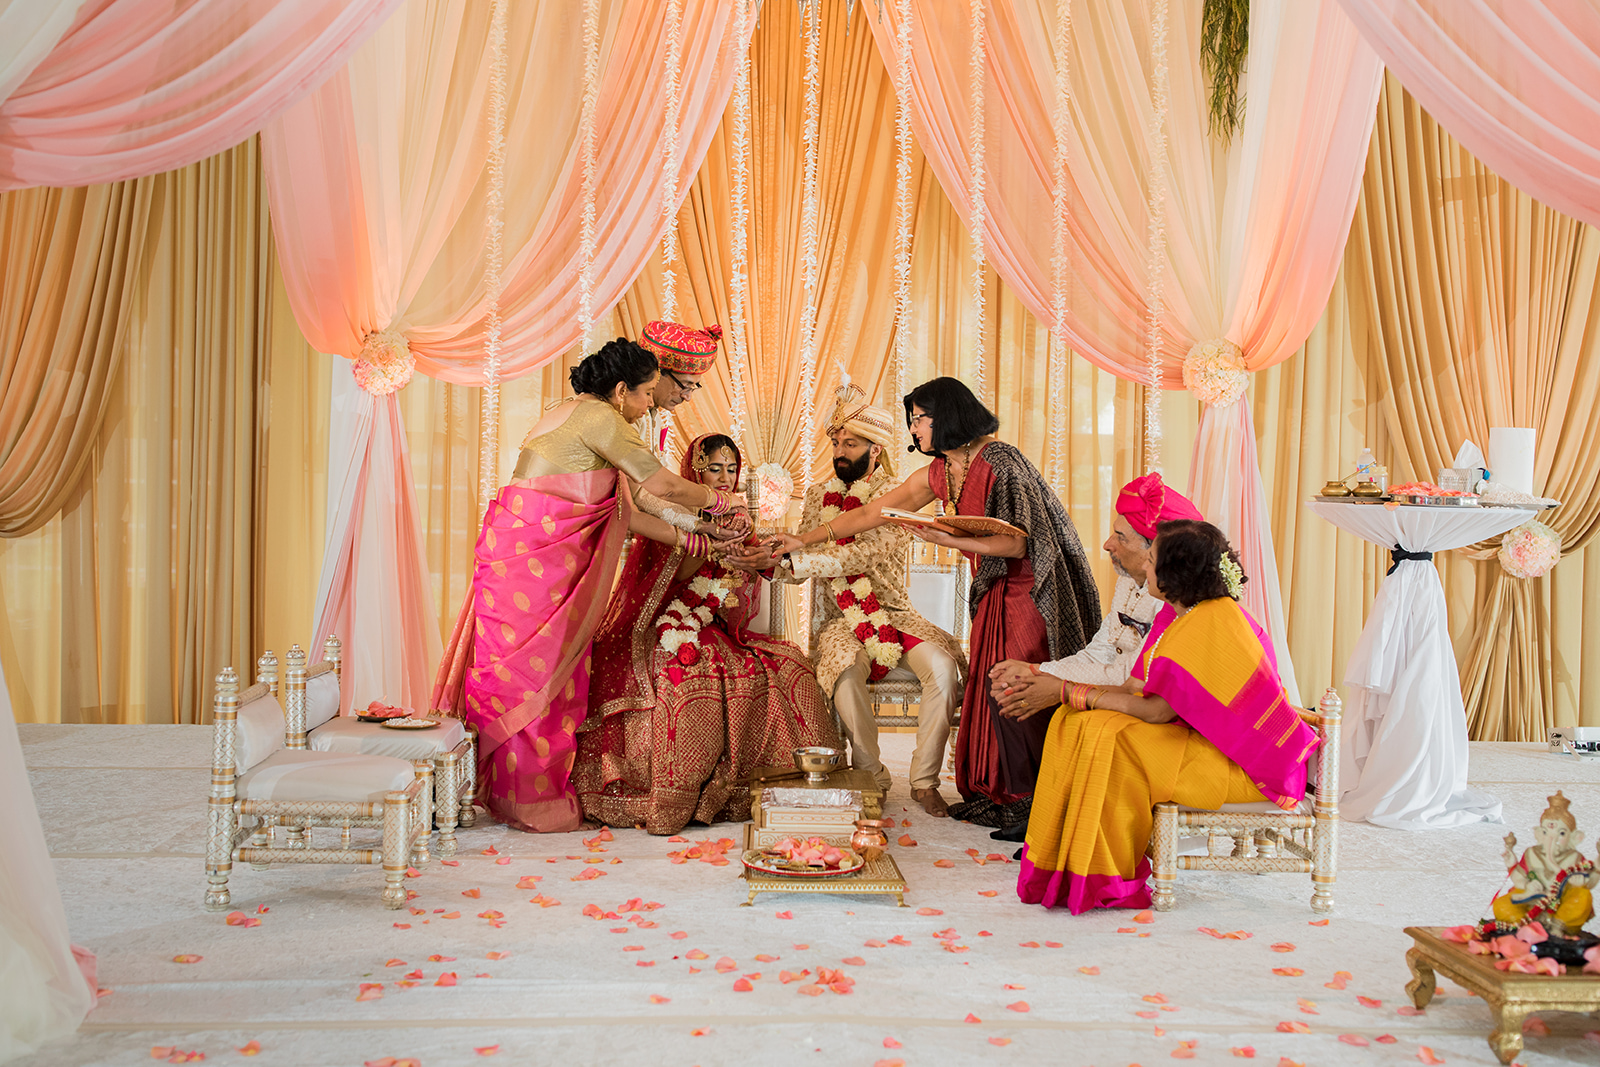 Le Cape Weddings - Sumeet and Chavi - Ceremony --41.jpg